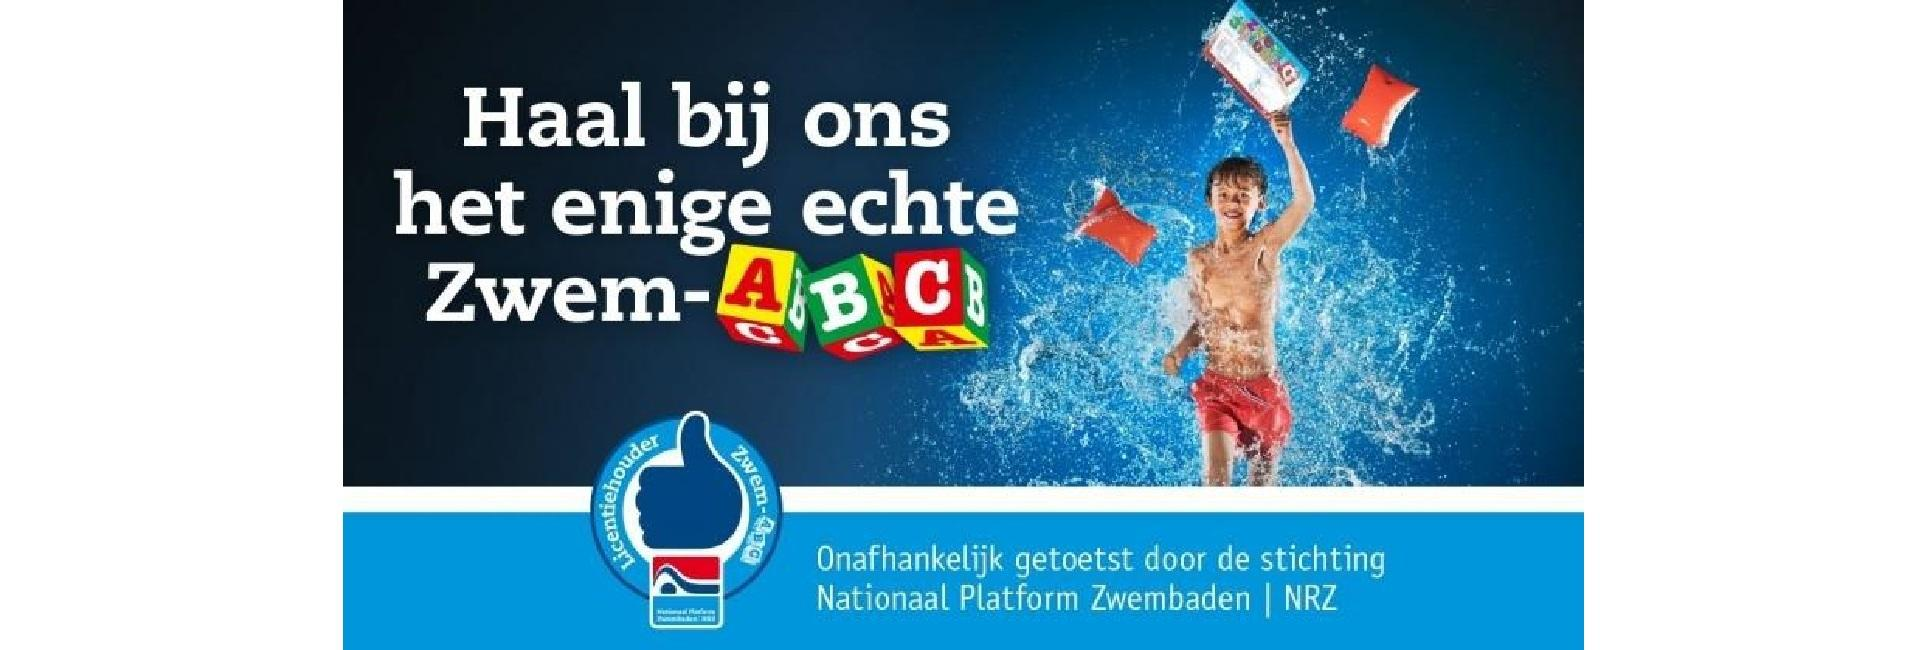 zwemles voor diploma zwemmen ABC